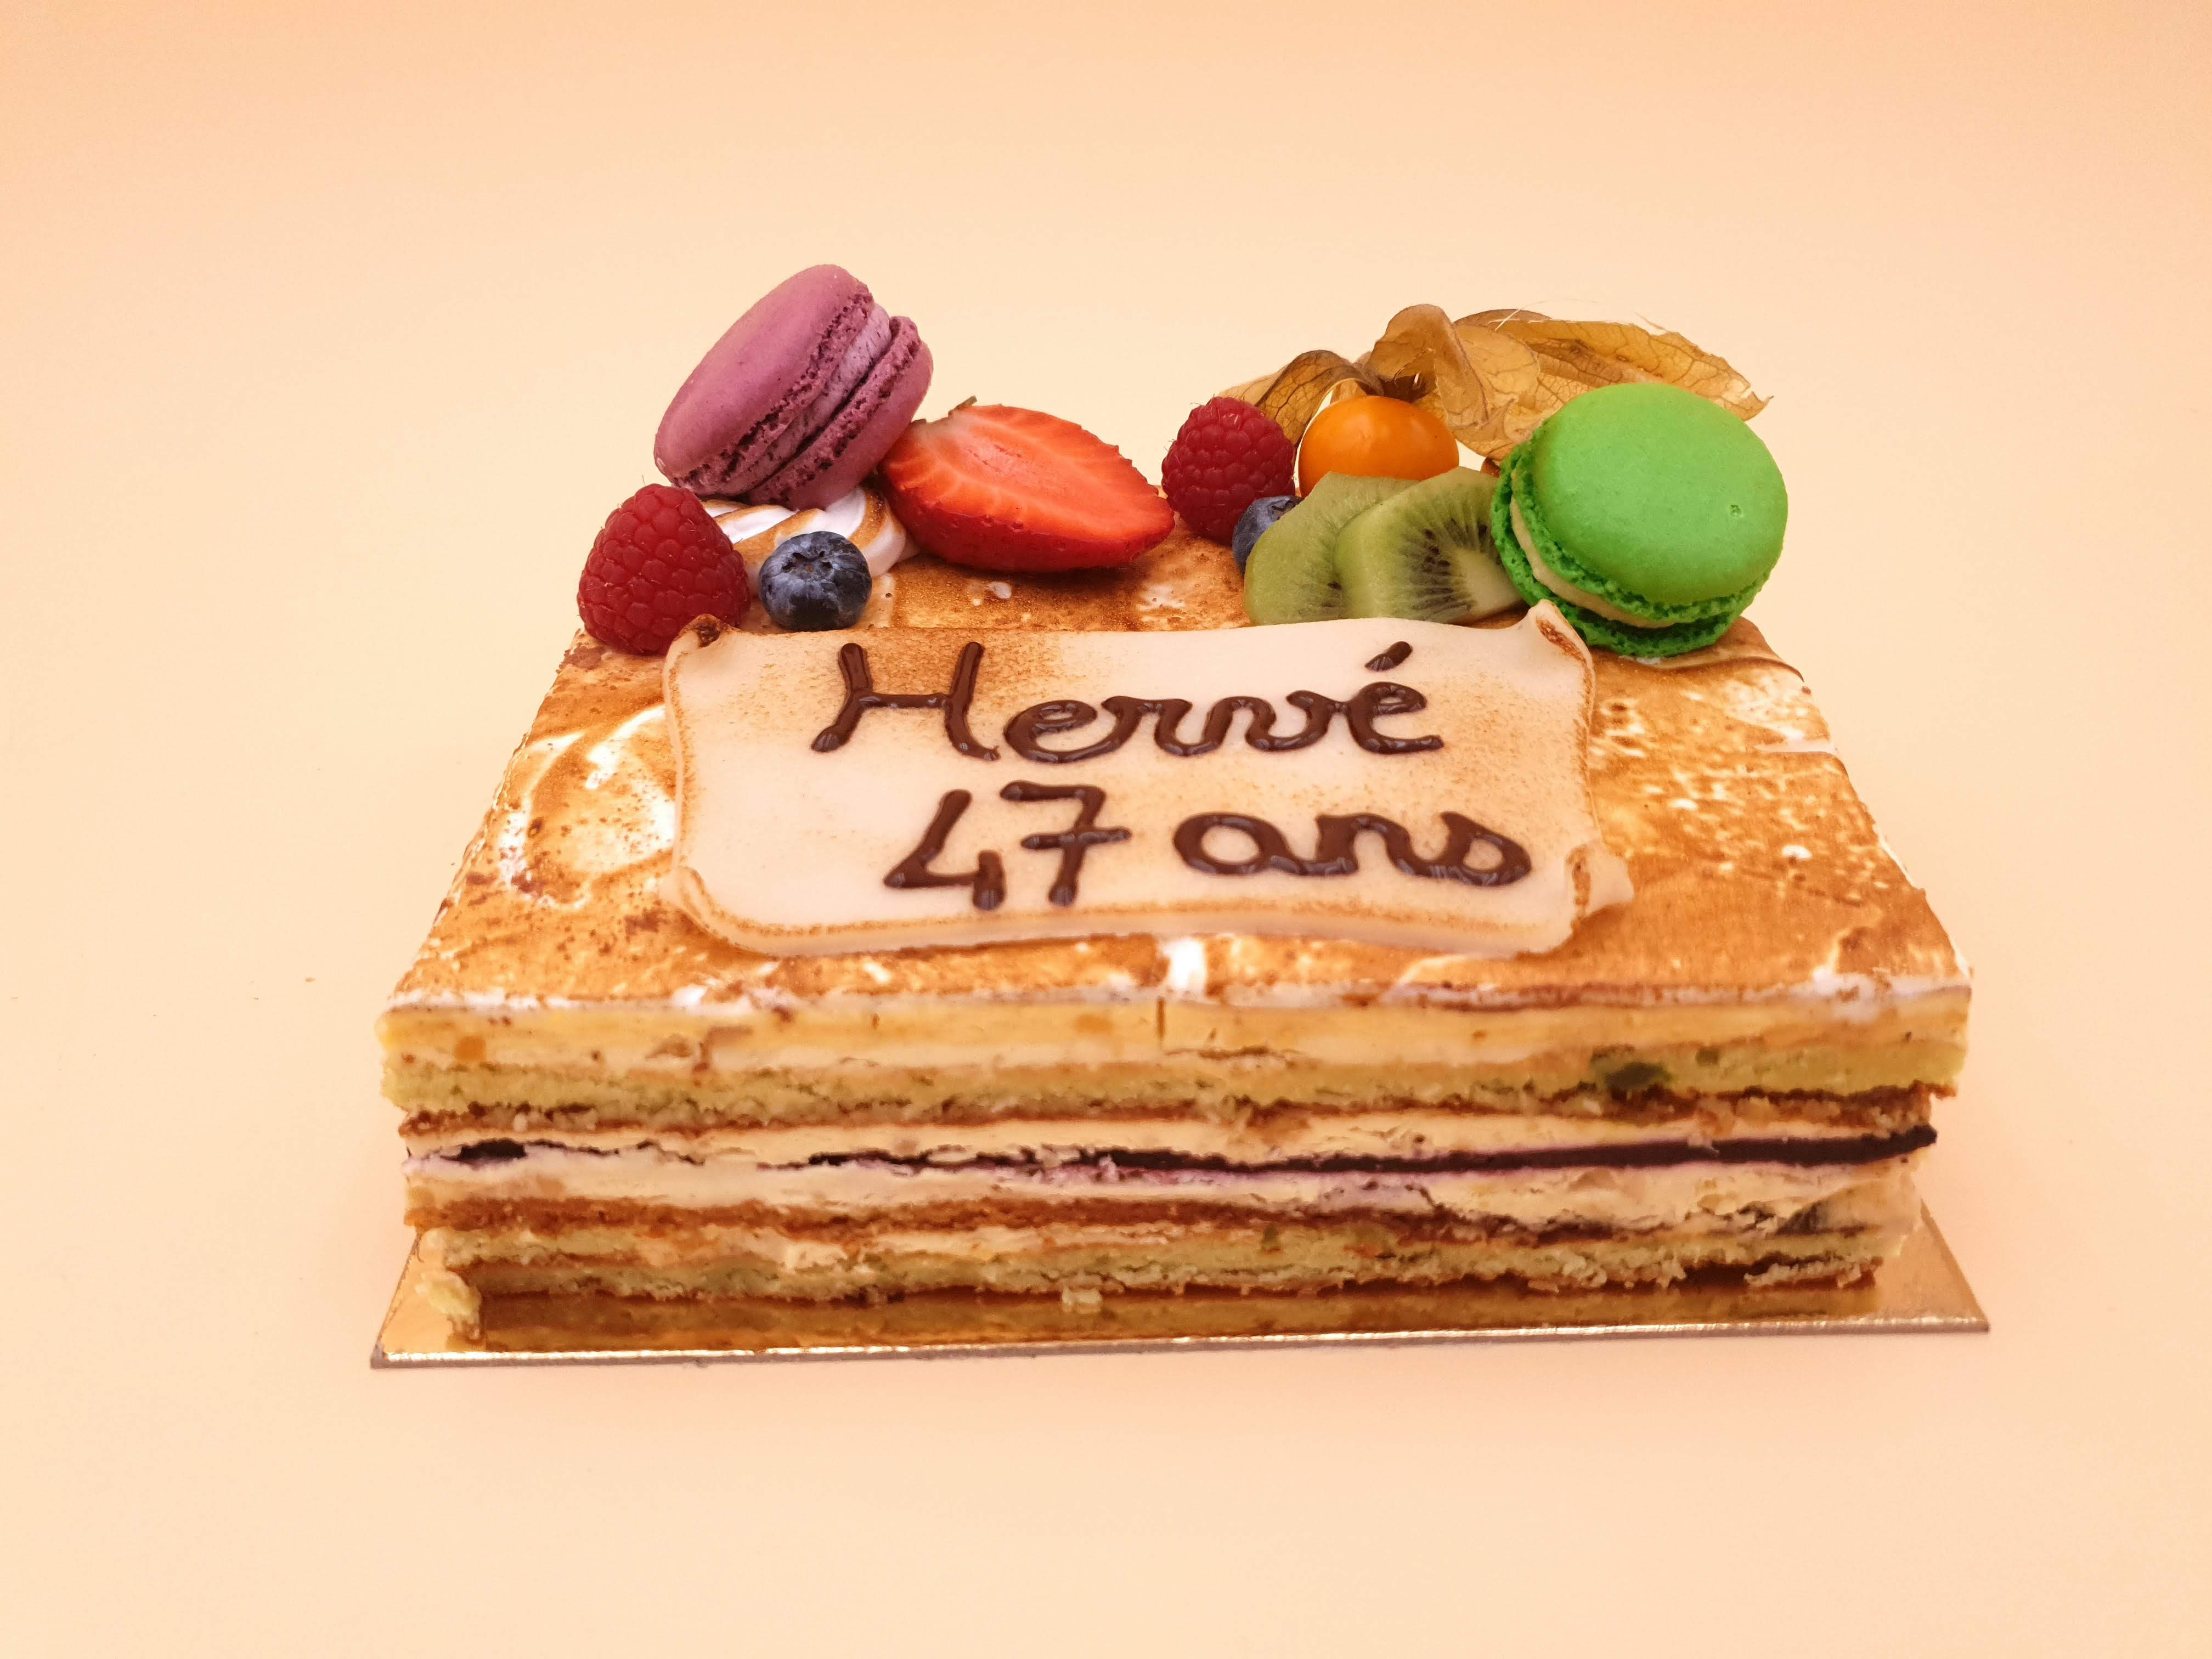 Number cake - Site de boulangerie-vd.fr